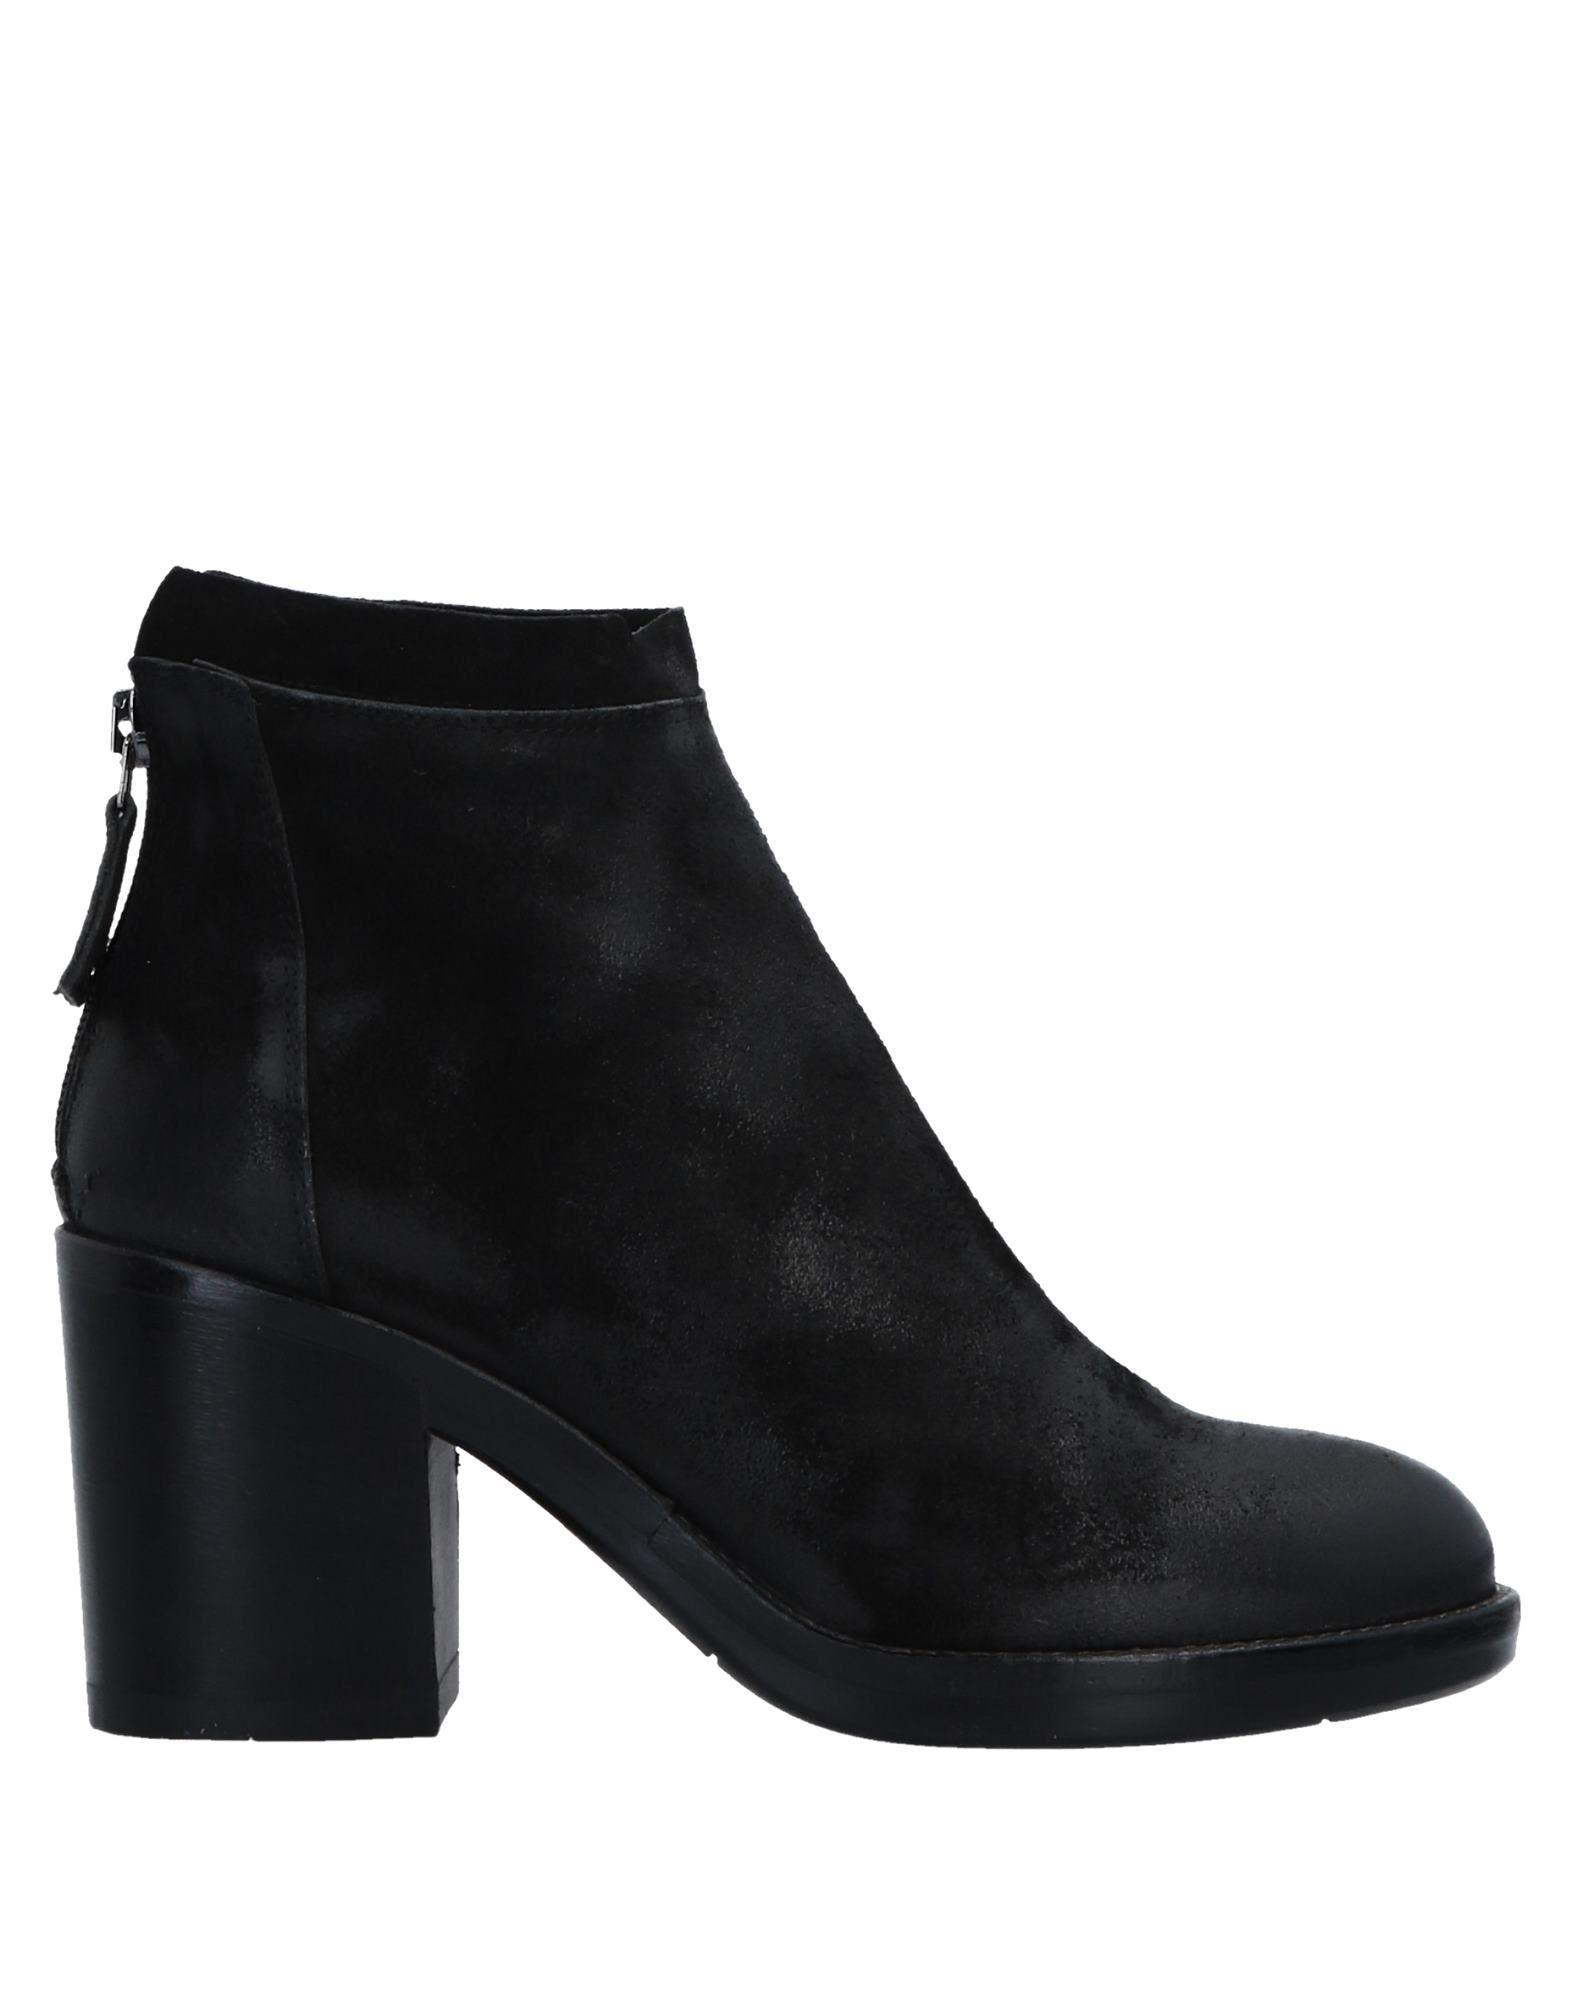 HUNDRED 100 Ankle Boot in Black